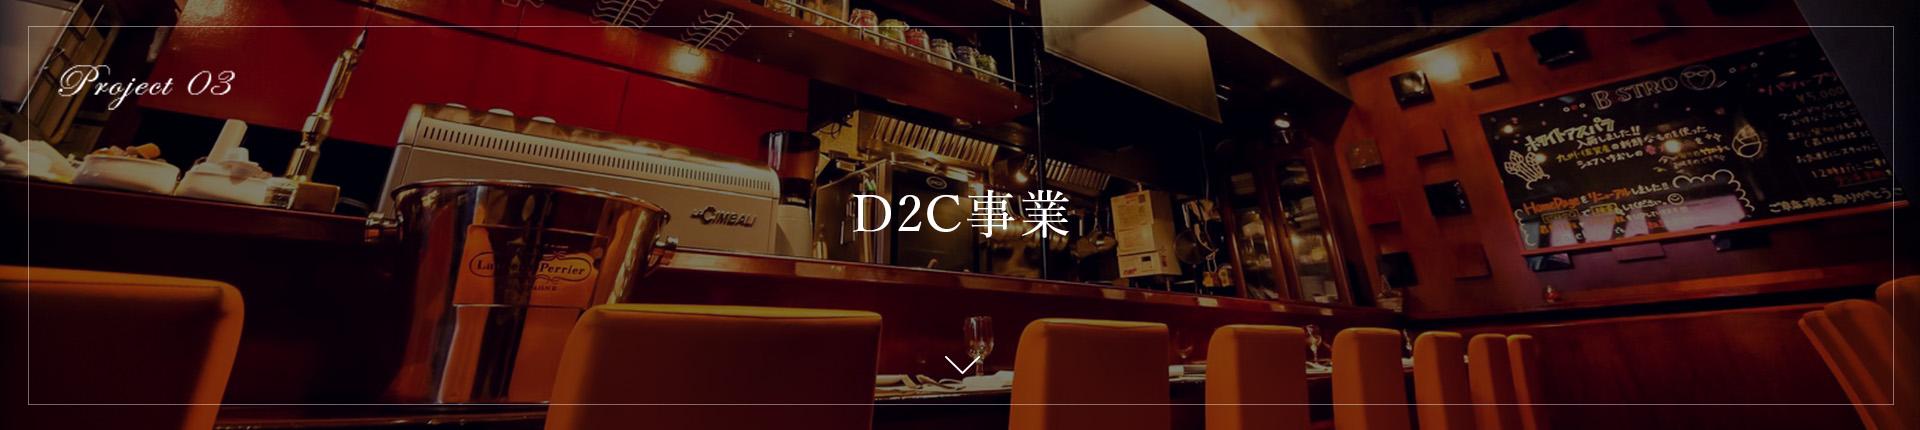 D2C事業